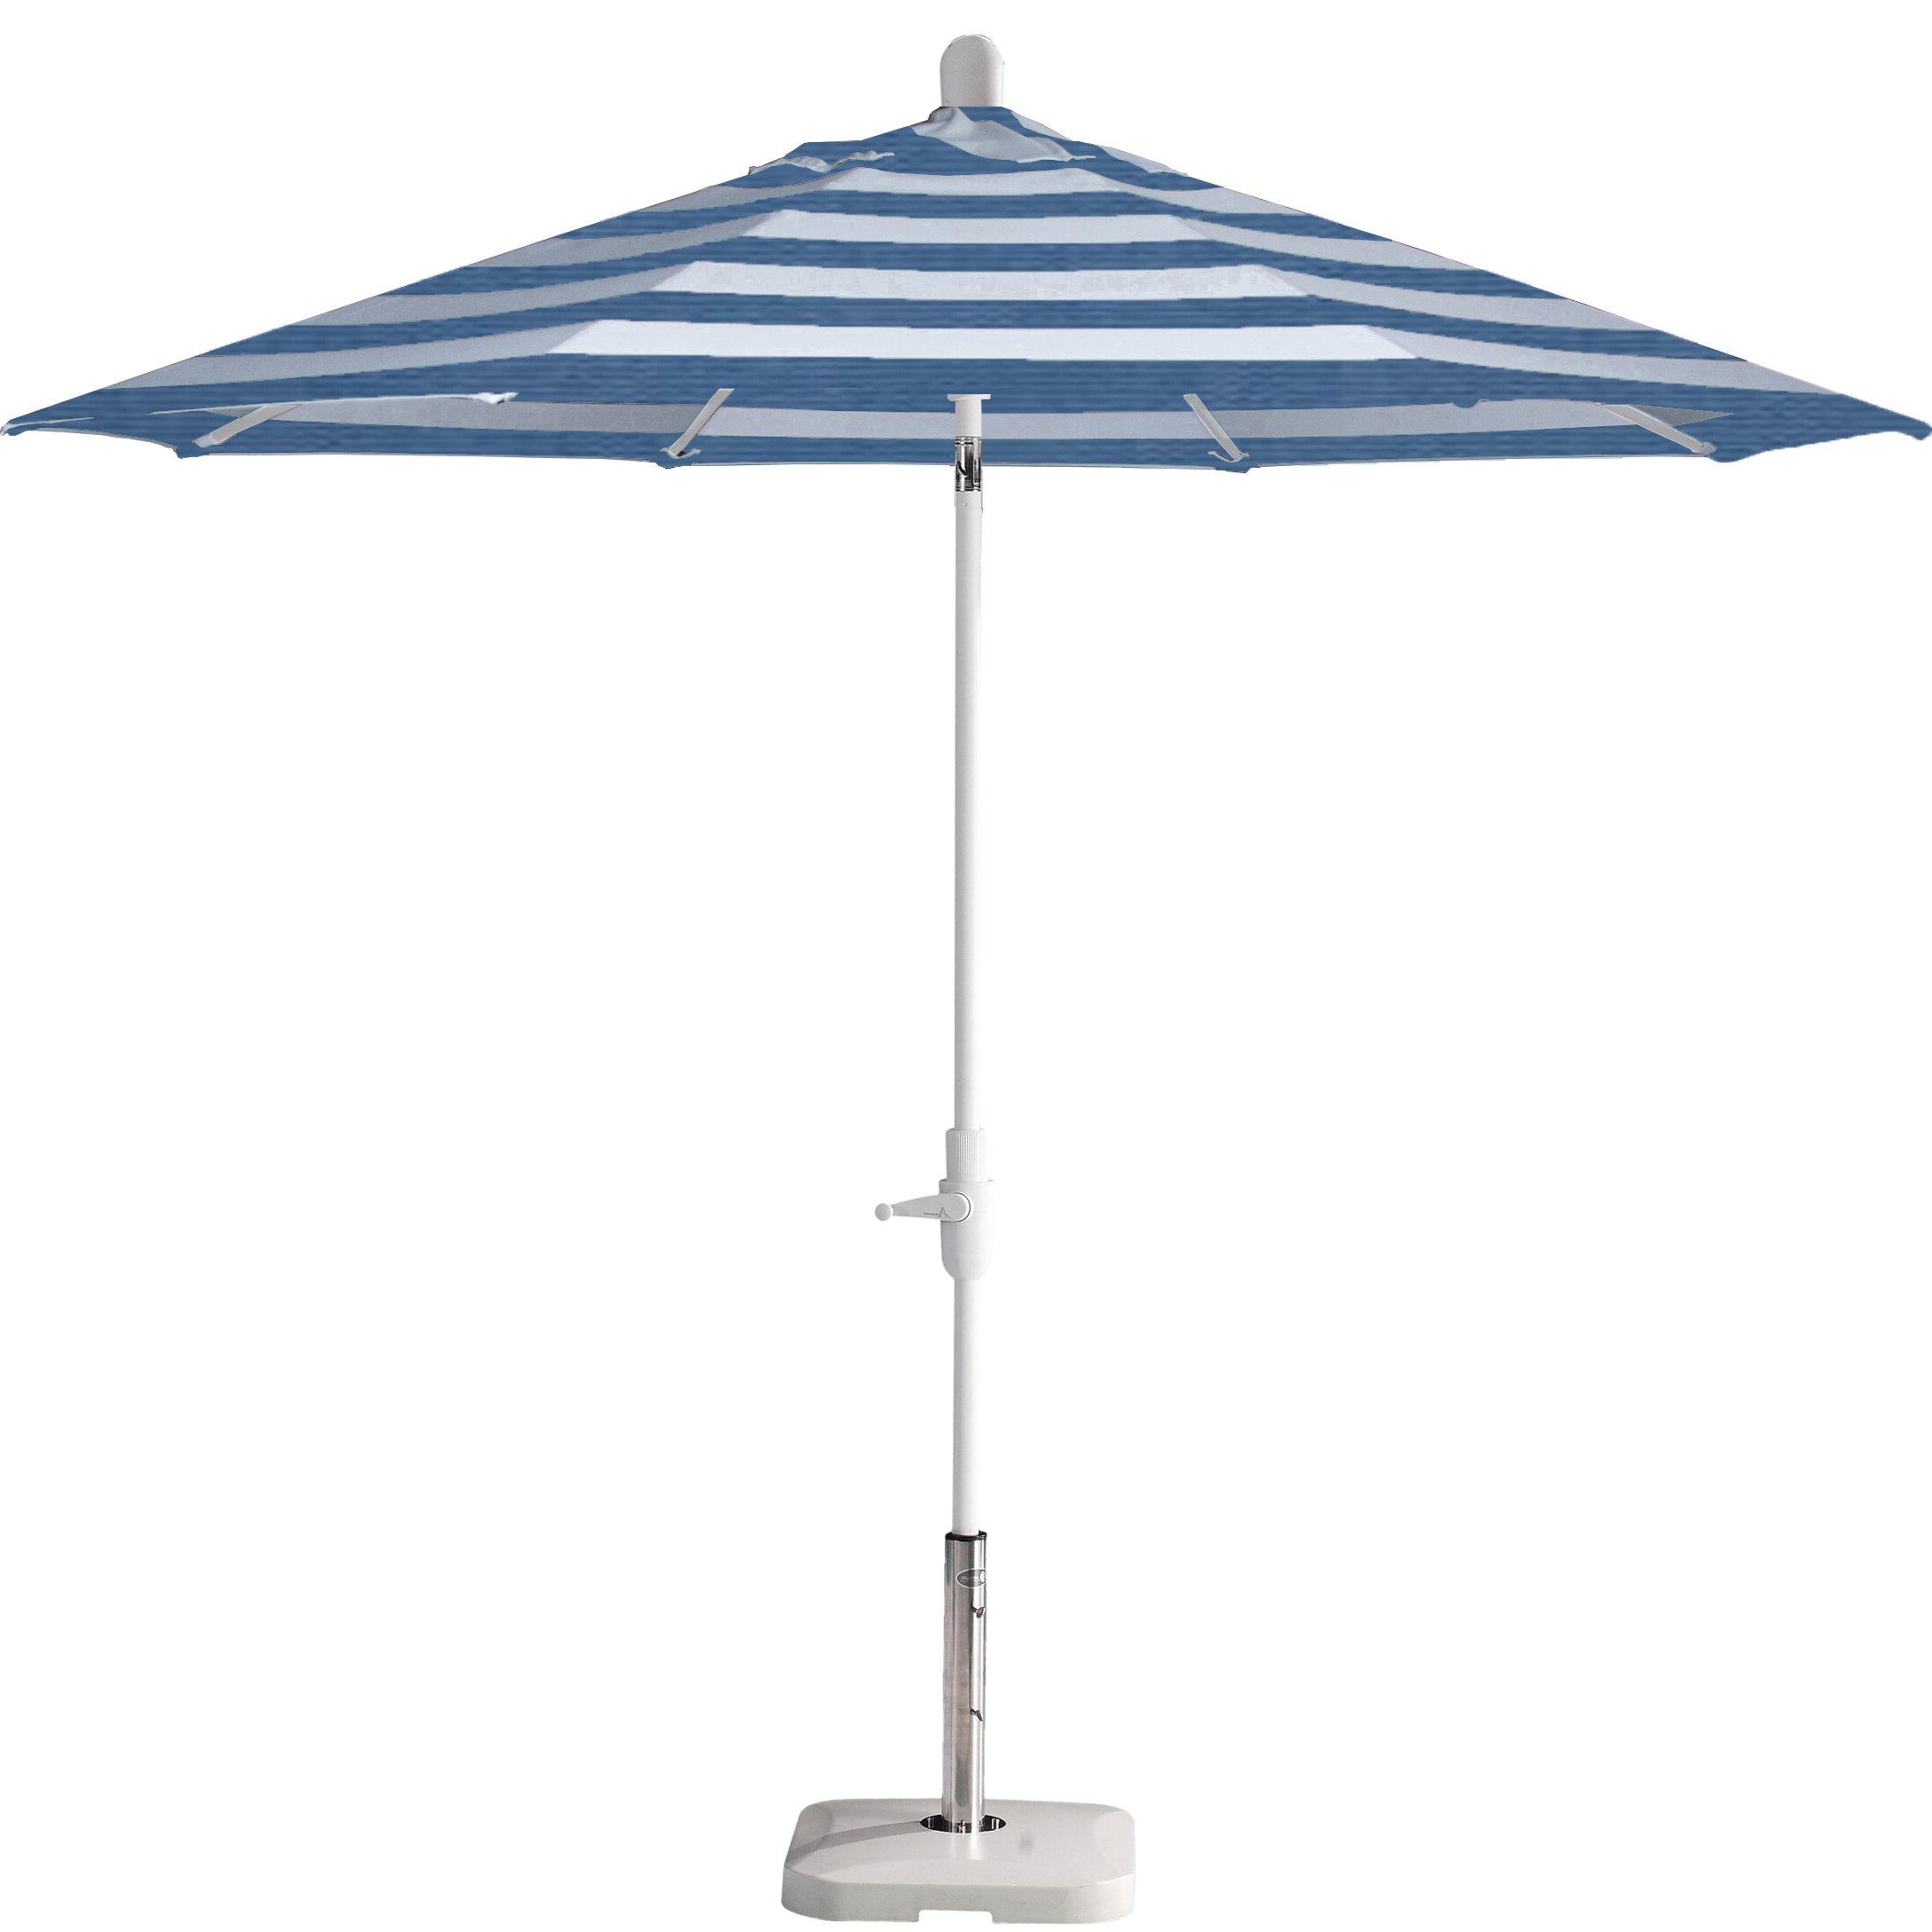 Wiebe Auto Tilt 9' Market Sunbrella Umbrella Throughout Newest Wiebe Auto Tilt Square Market Sunbrella Umbrellas (View 5 of 20)